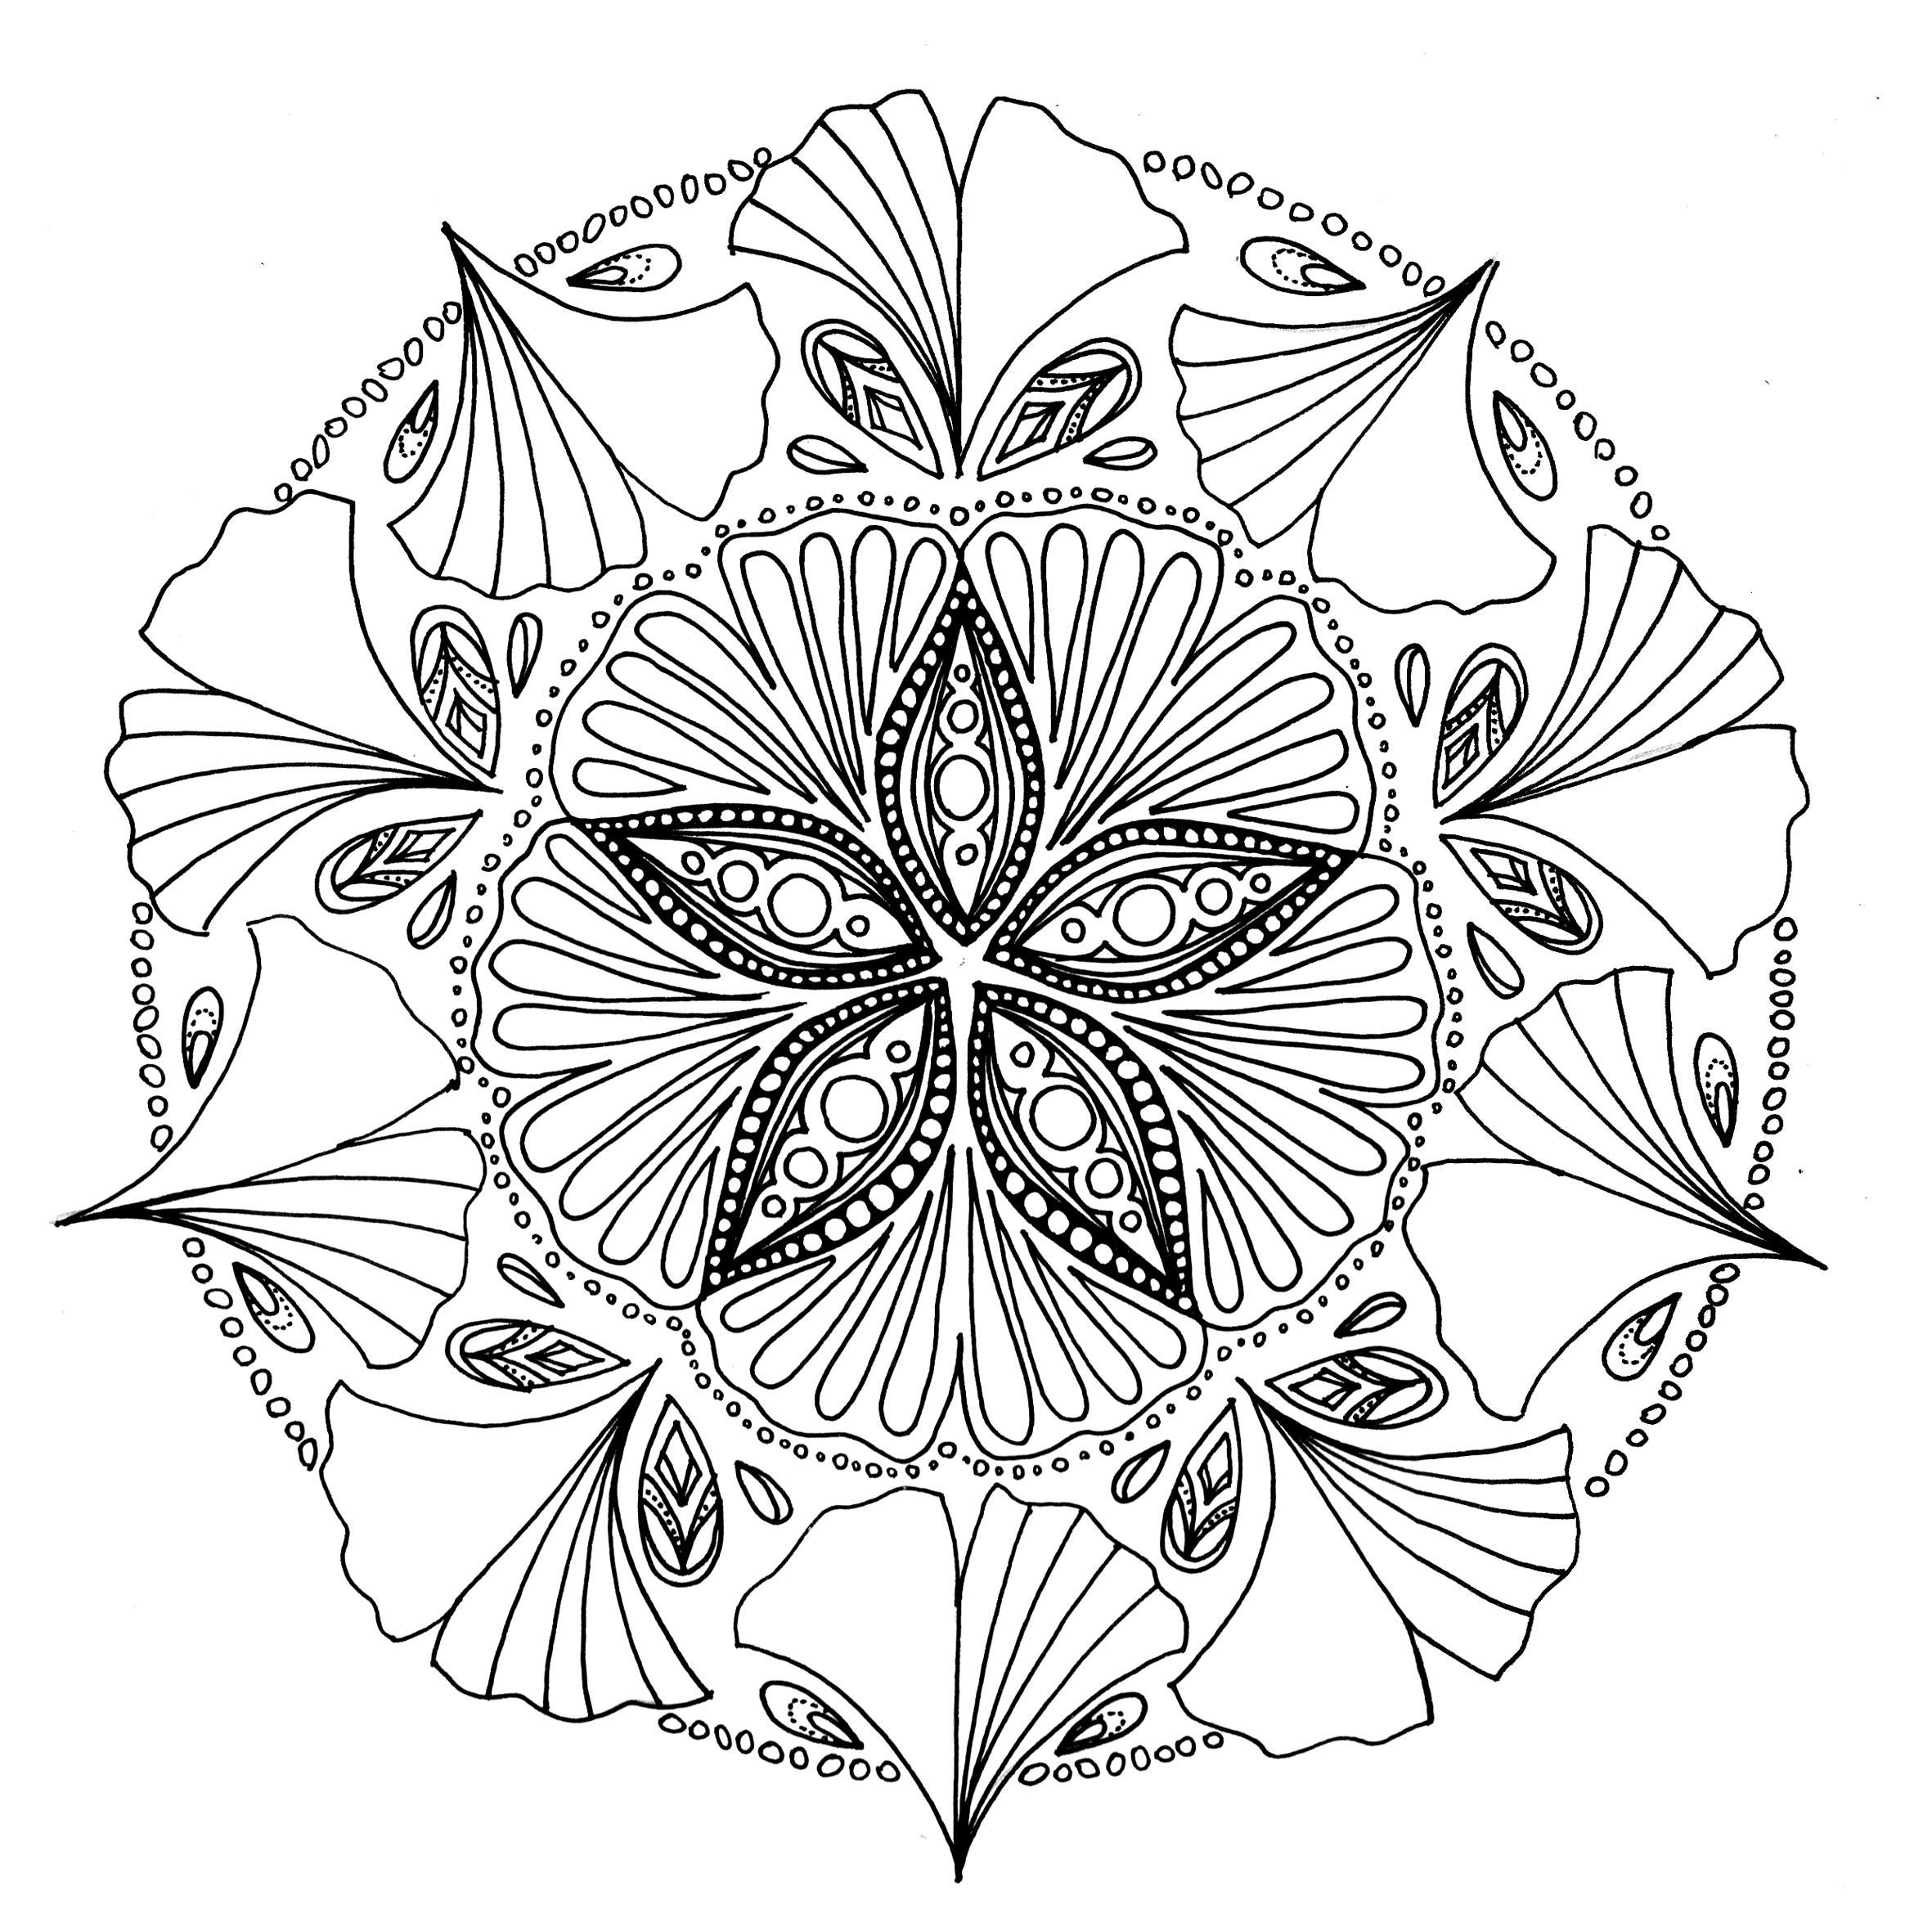 Projet Coloriages Anti-Stress – Part 6 – Le Chocobo tout Coloriage Mandala Anti Stress